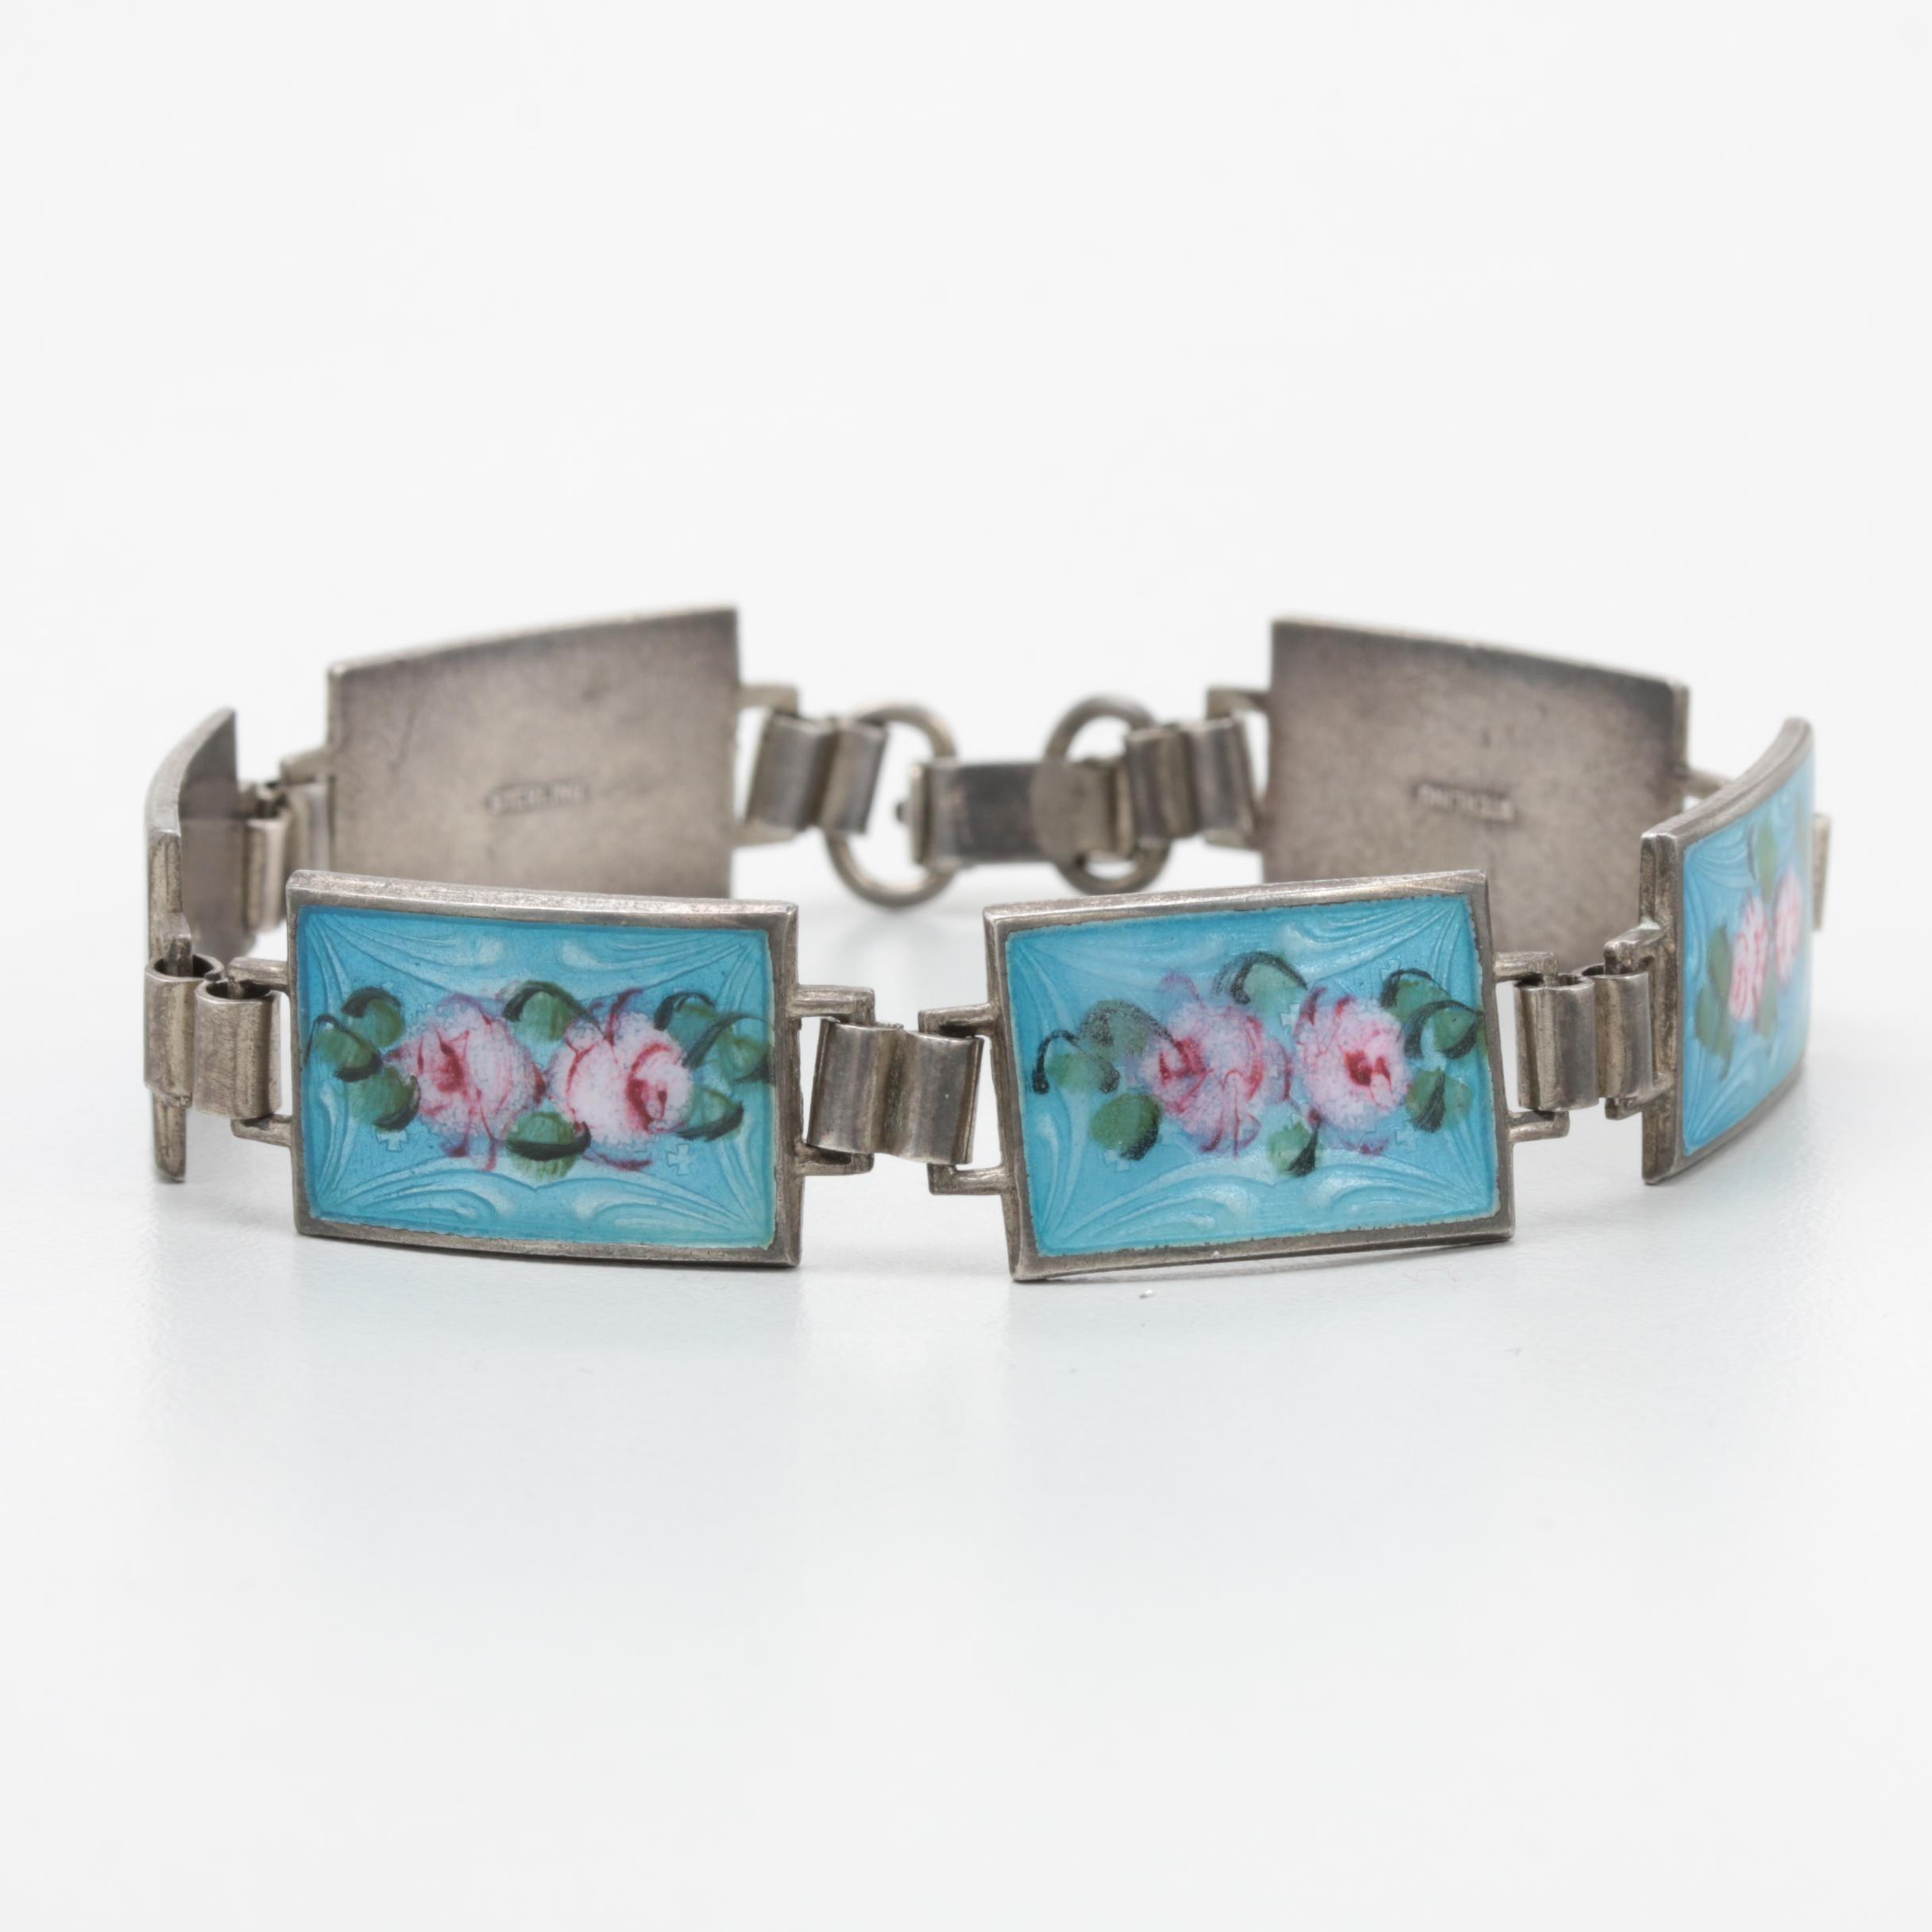 Circa 1930s Sterling Silver Guilloche Enamel Bracelet